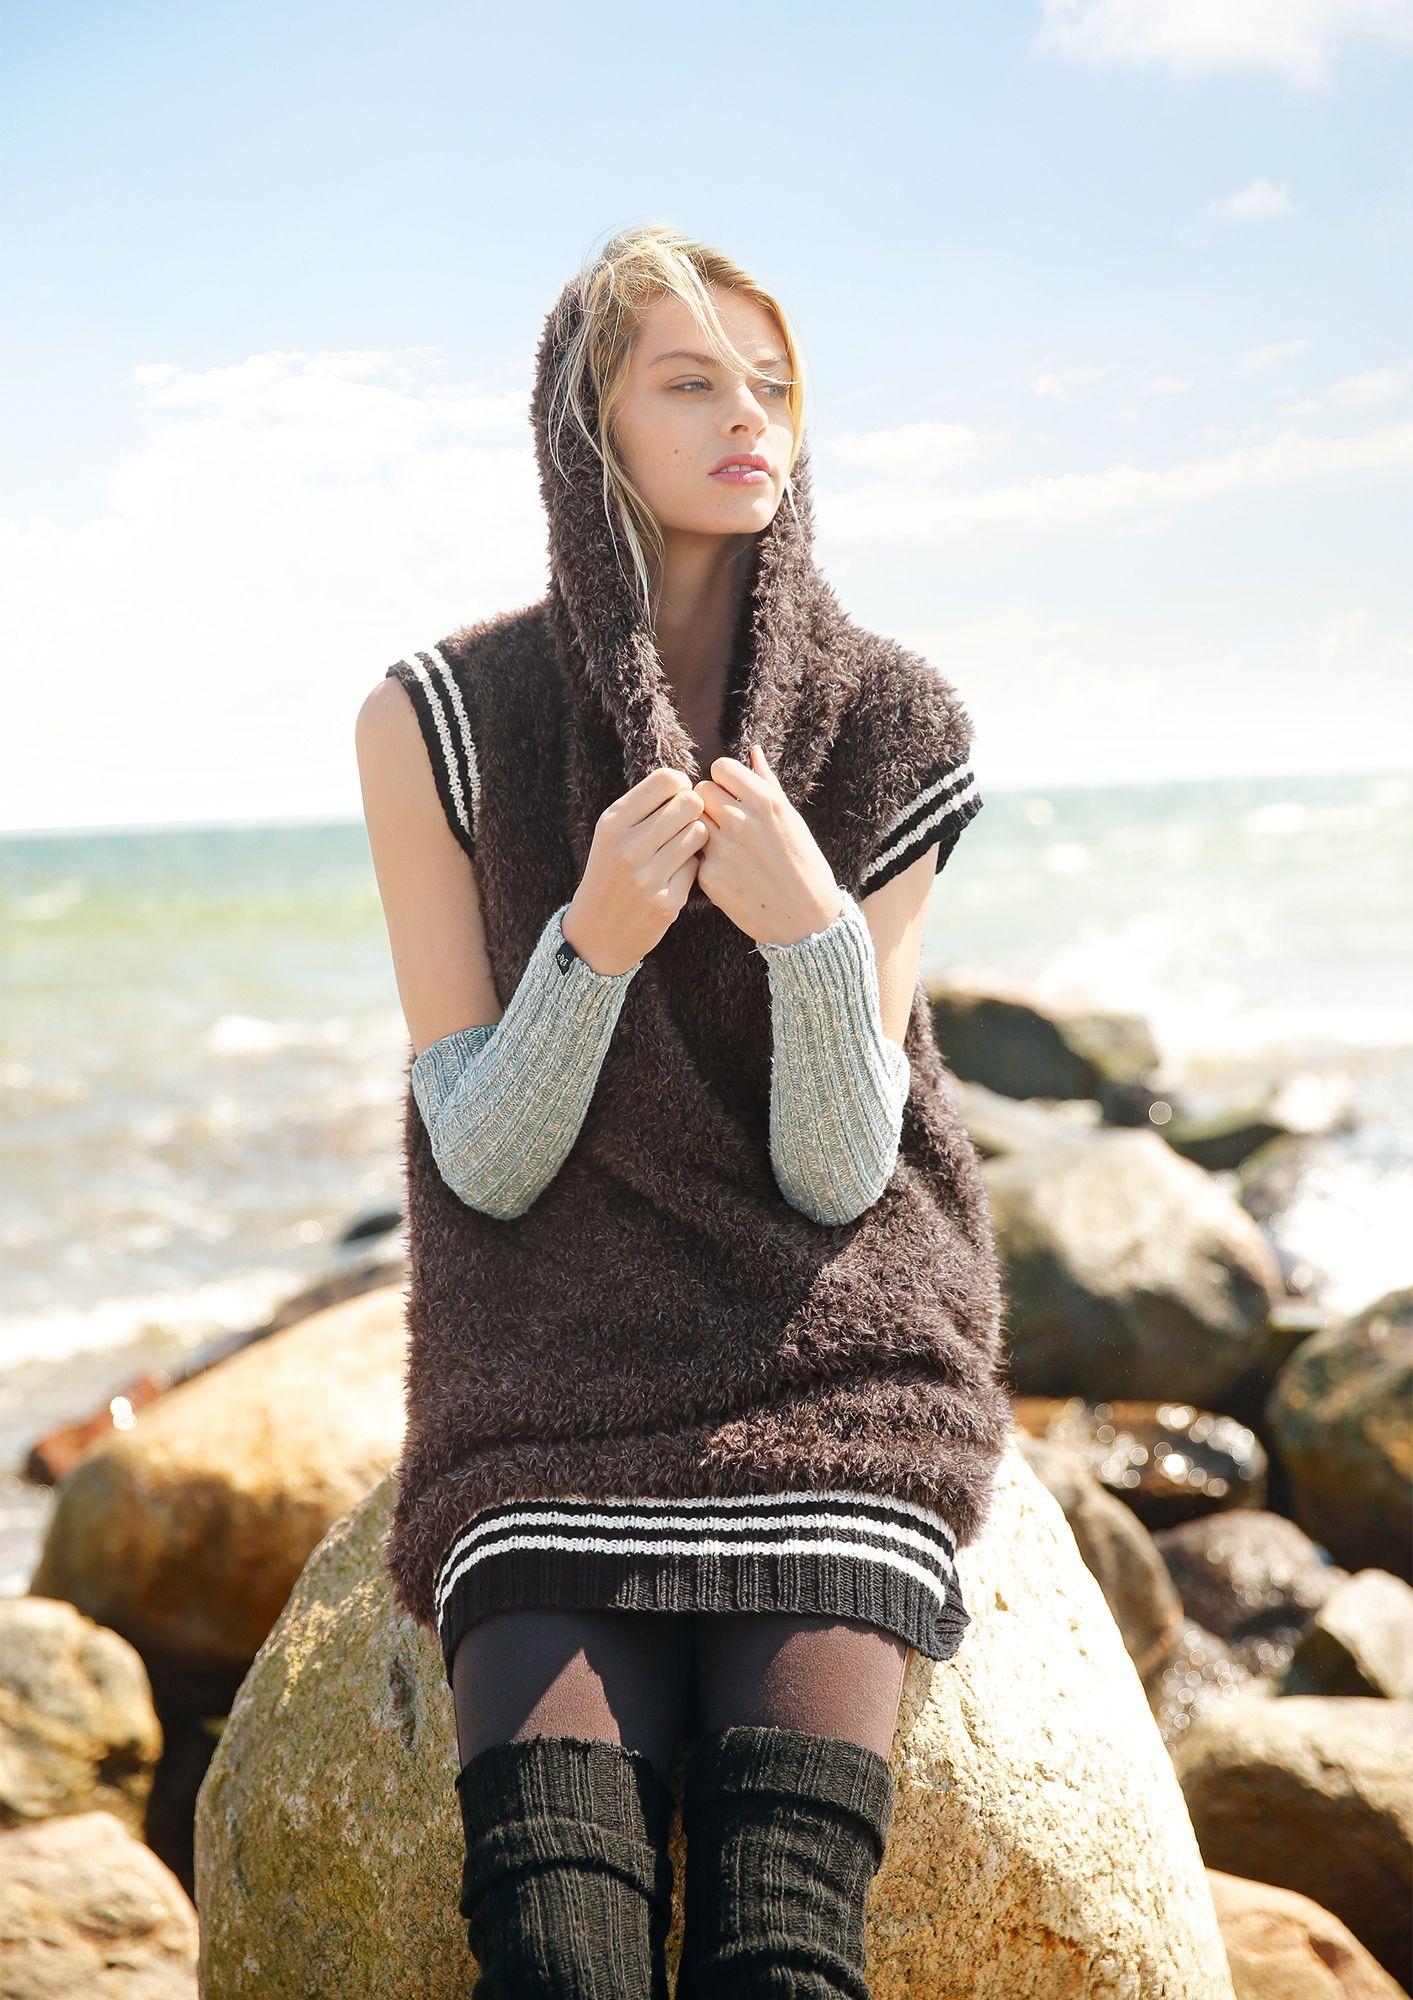 Plüsch-Kleid | Pinterest | Articles and Detail